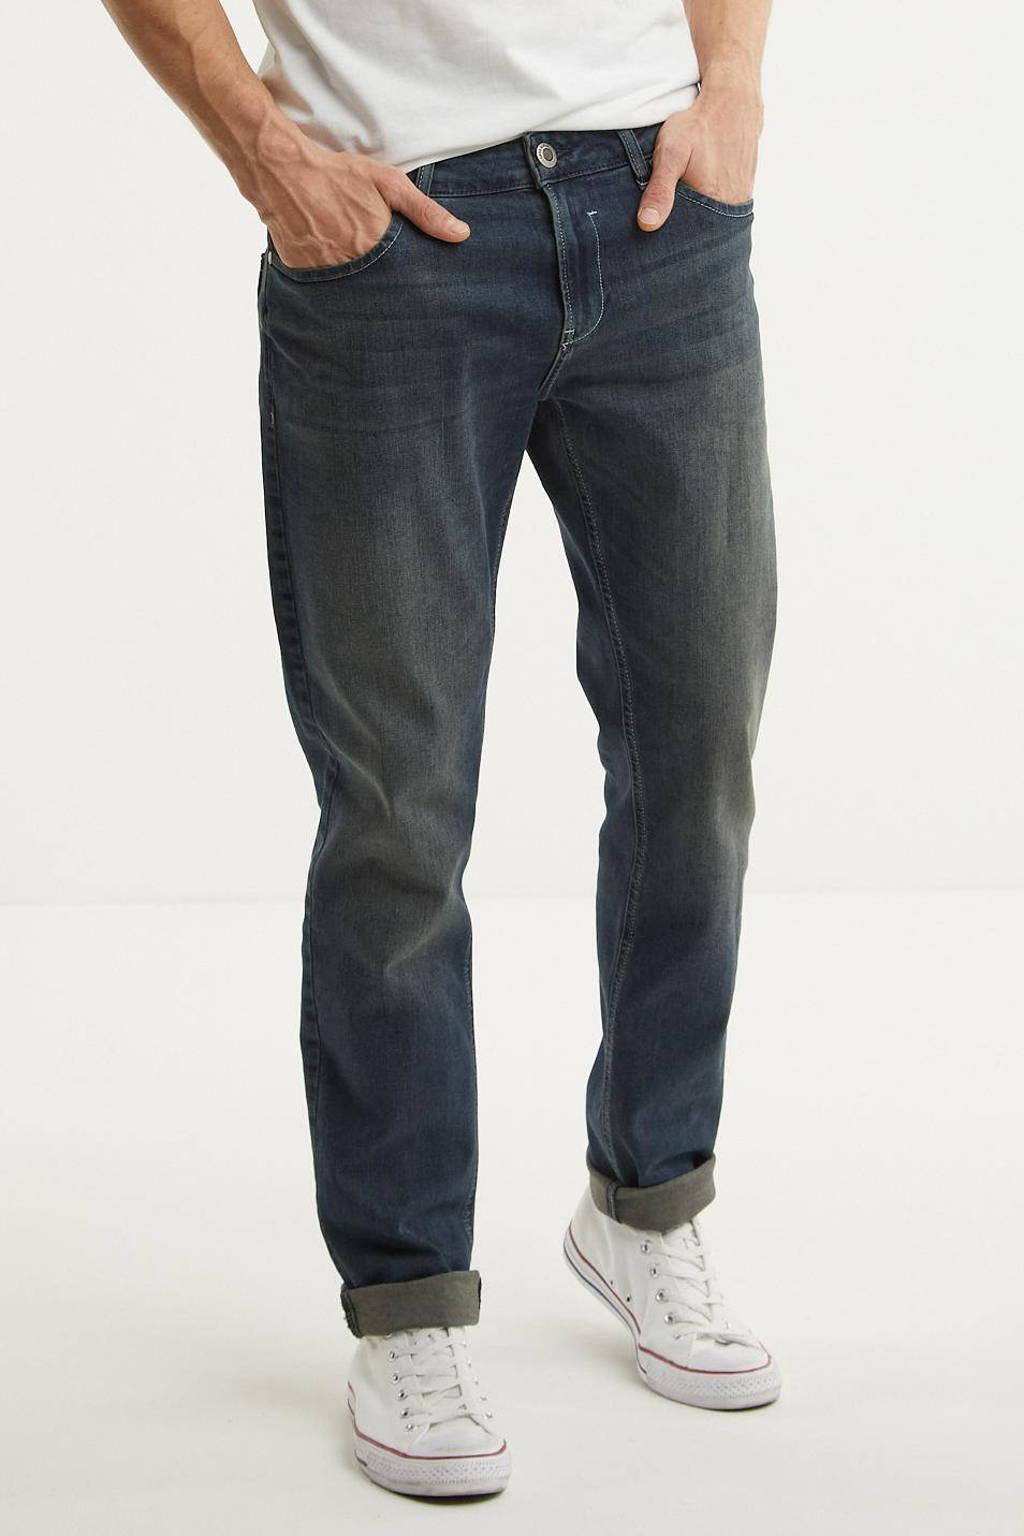 Cars tapered fit jeans Shield dark used, 03 Dark Used